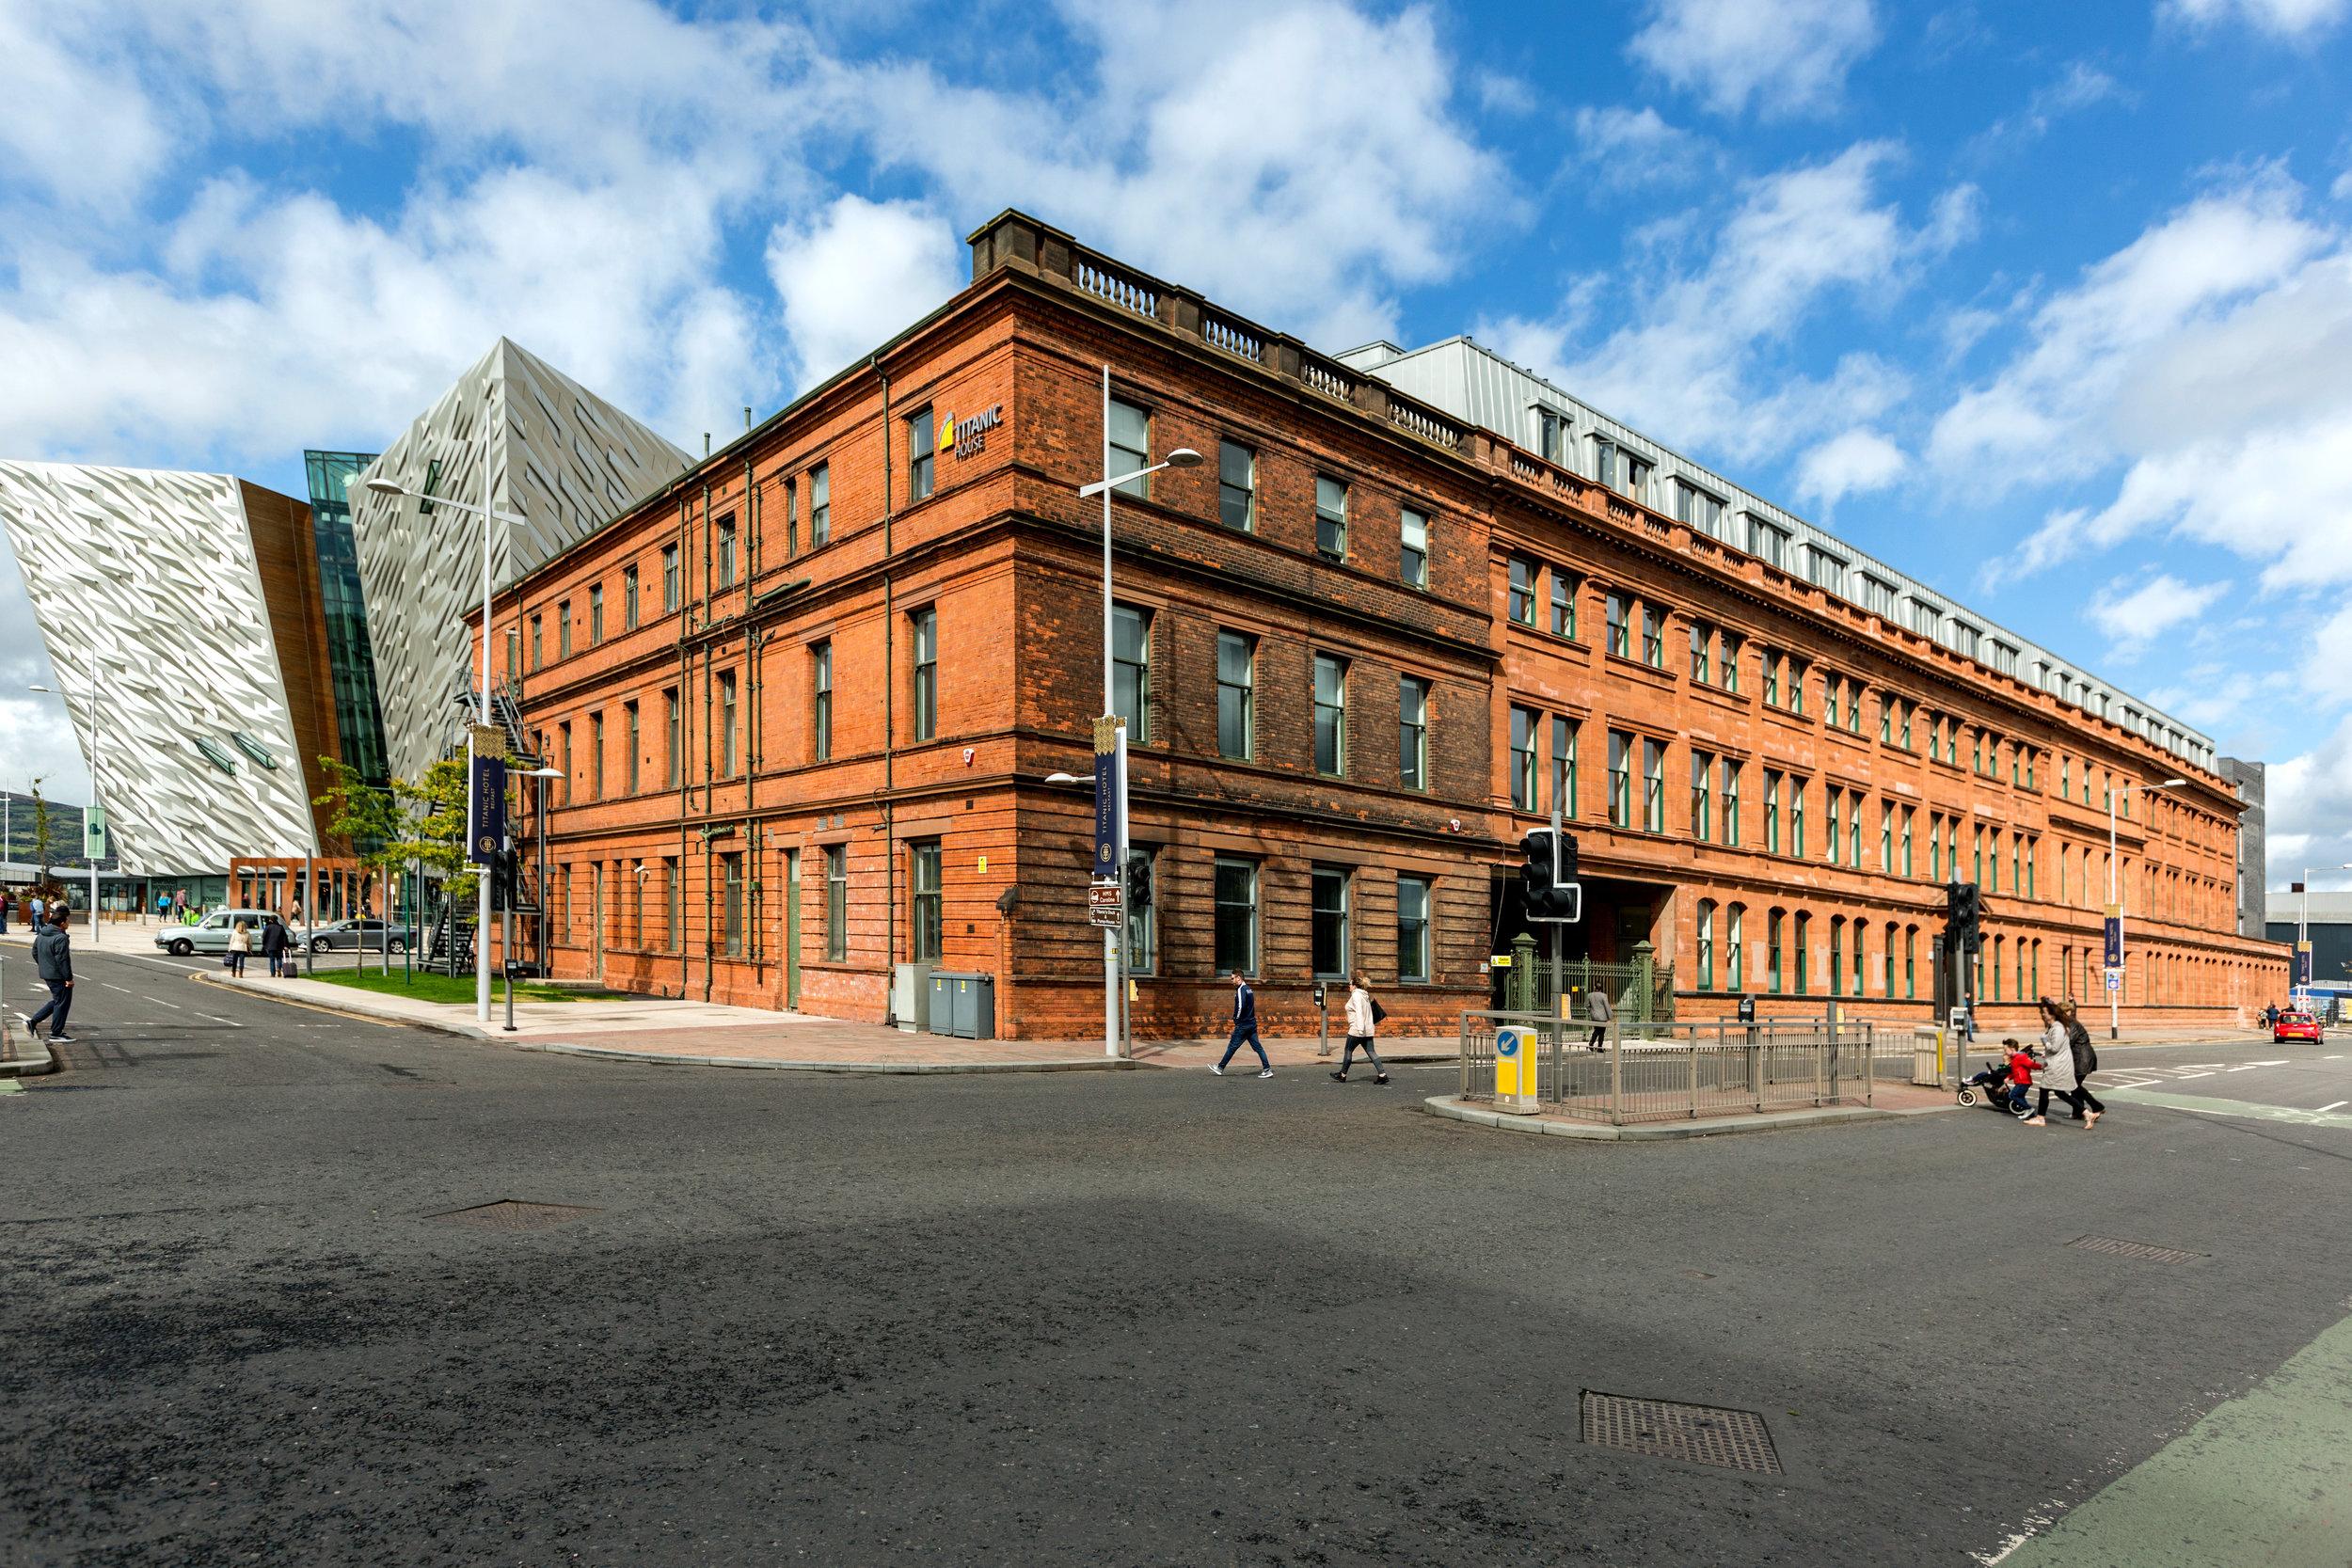 Exteriors-Titanic-Hotel-Belfast-239.jpg